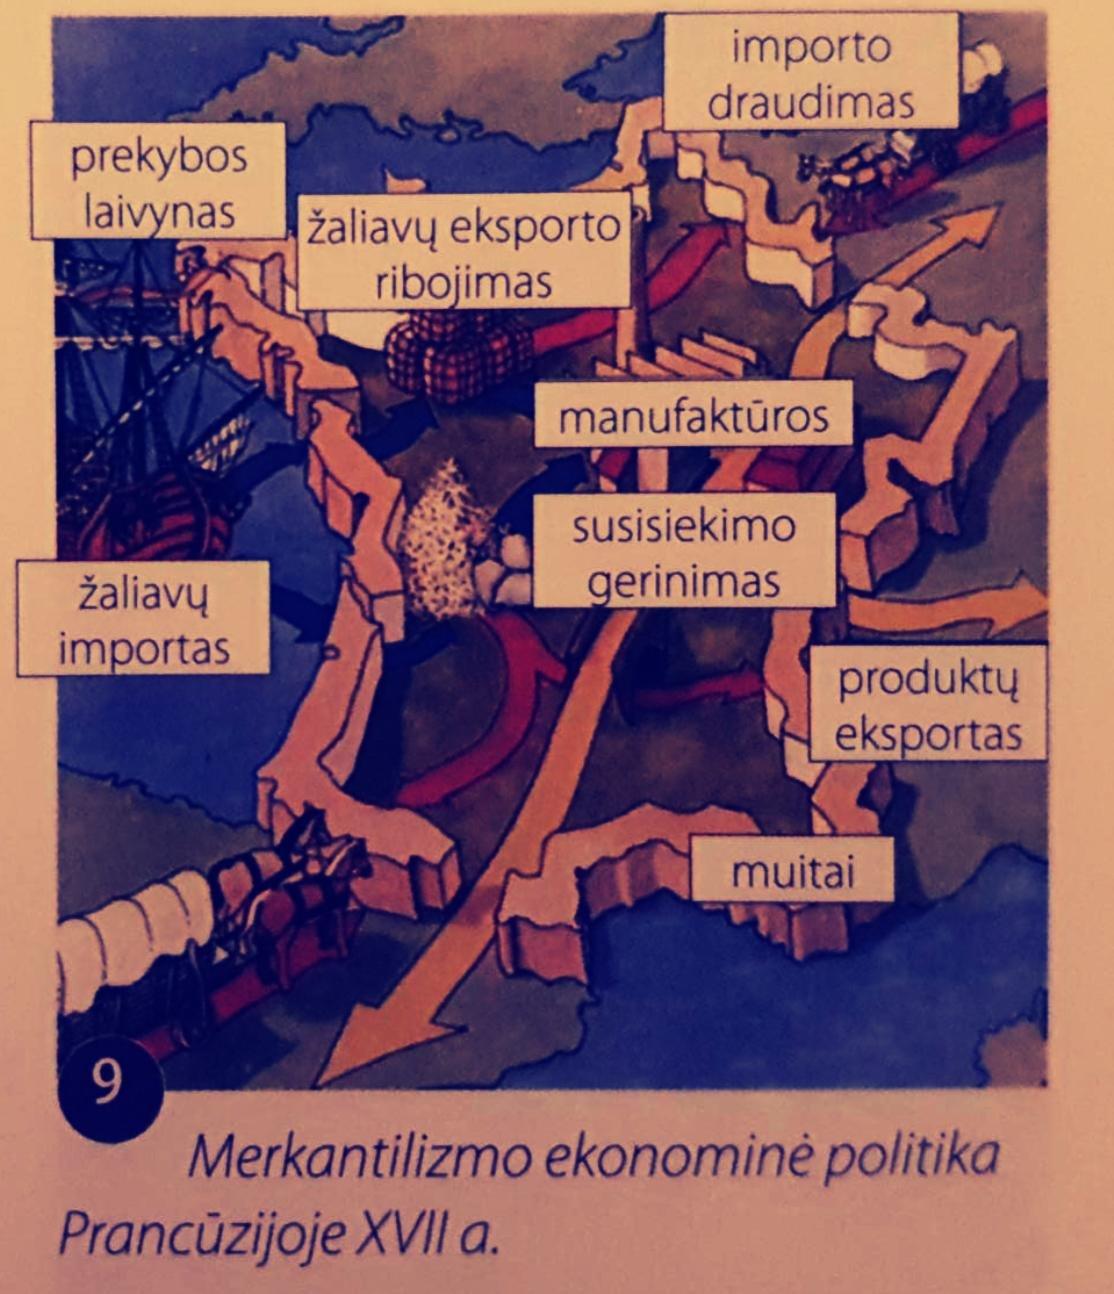 Merkantilizmas / Mercantilism